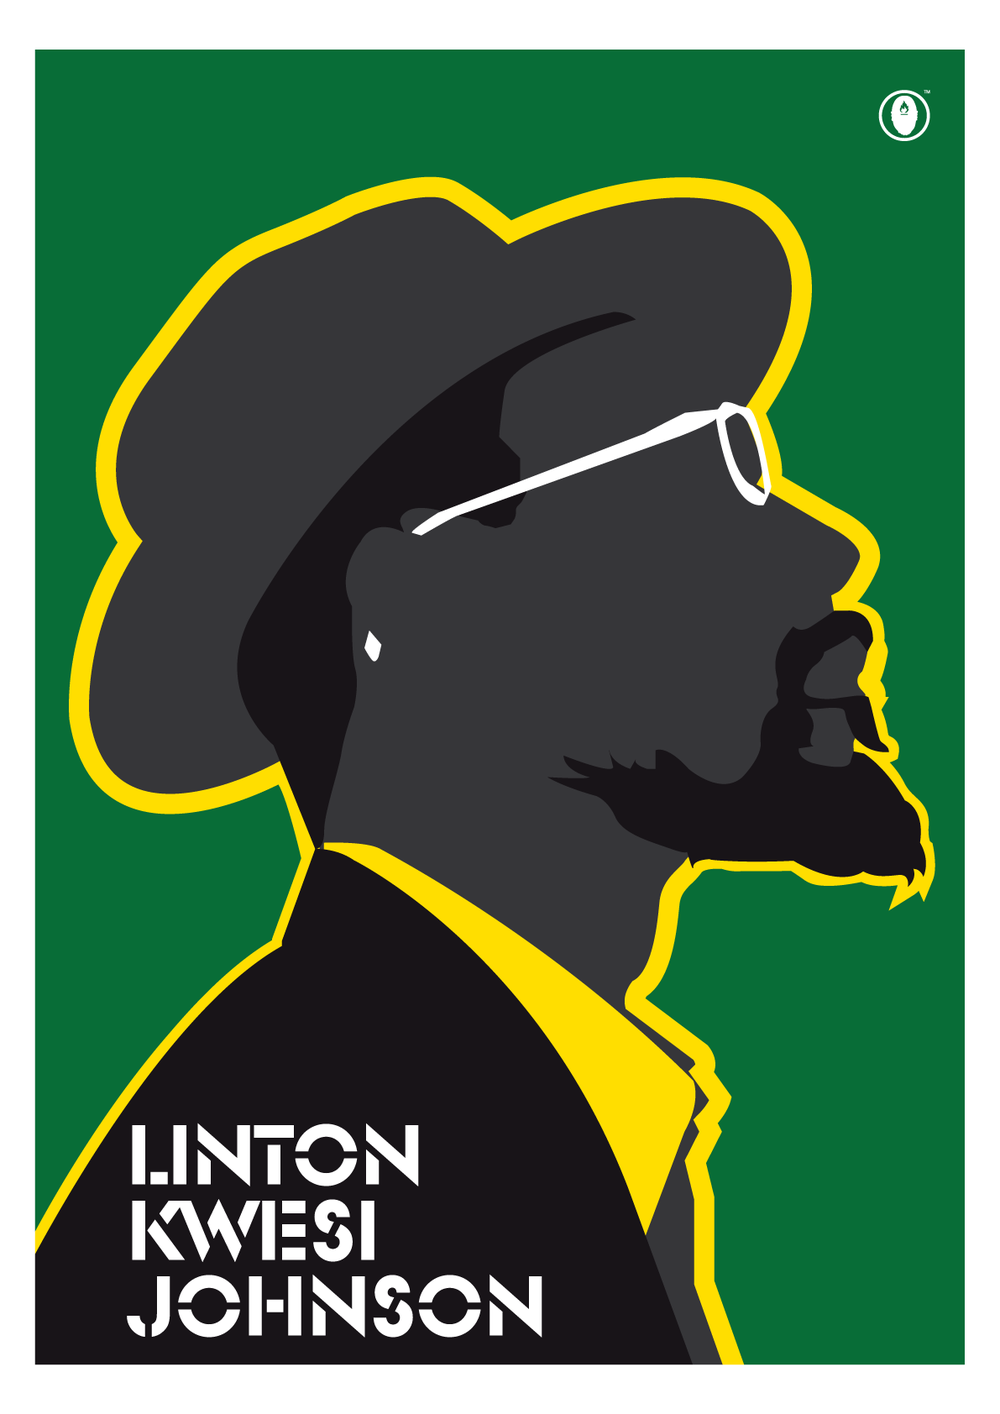 Image of 'LINTON'